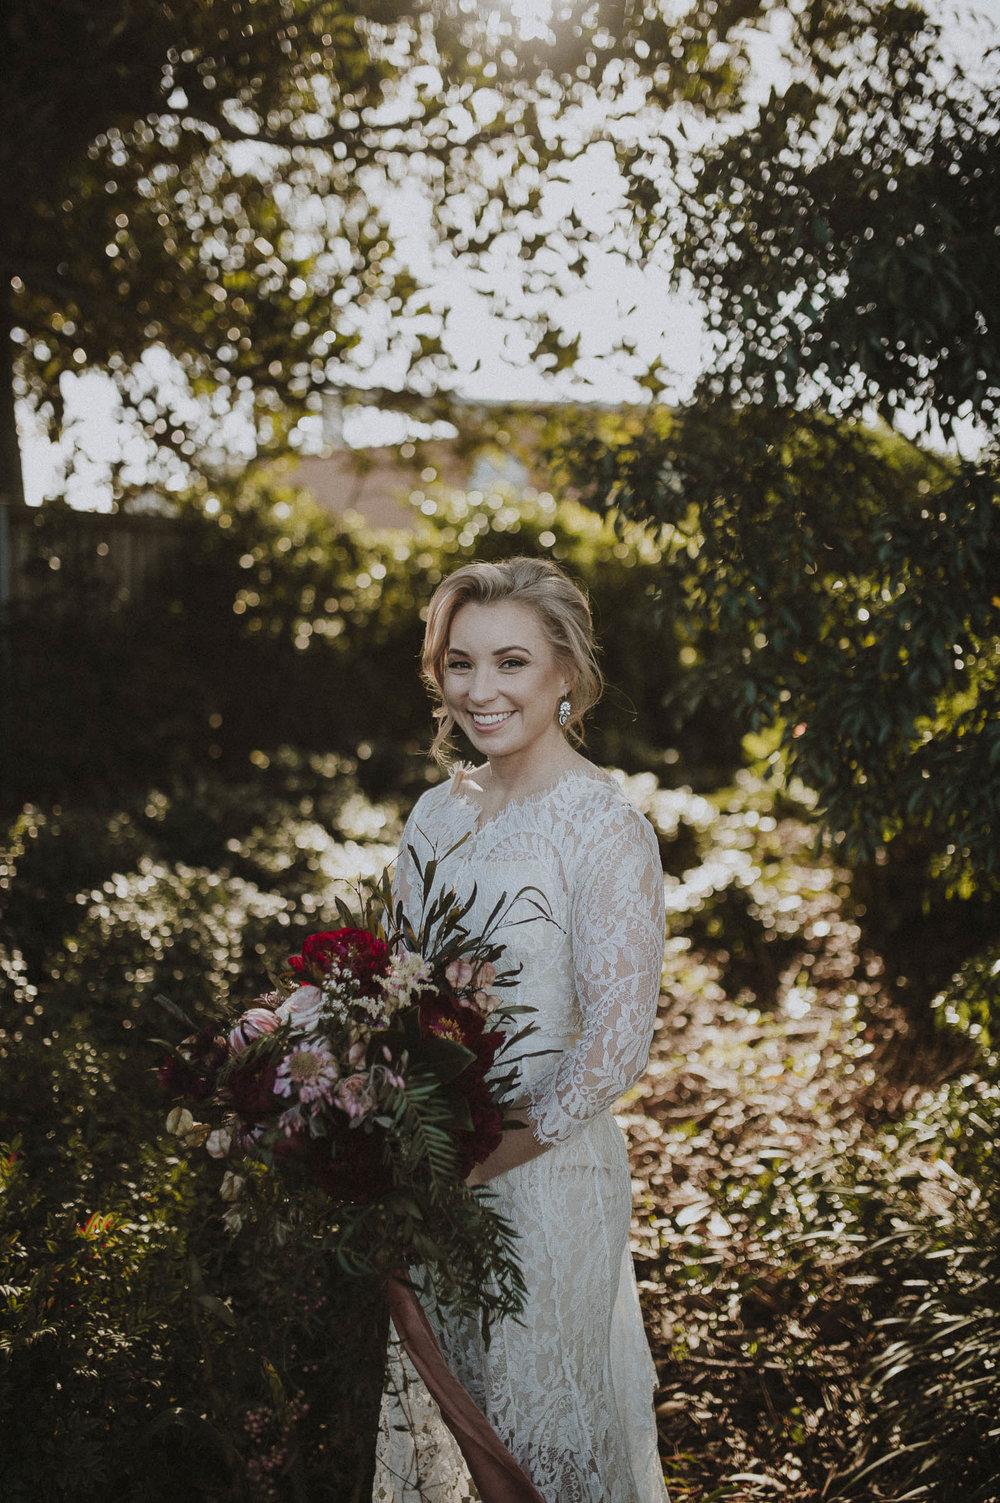 Joel_Laura_Newcastle_Wedding_Blog-5.jpg